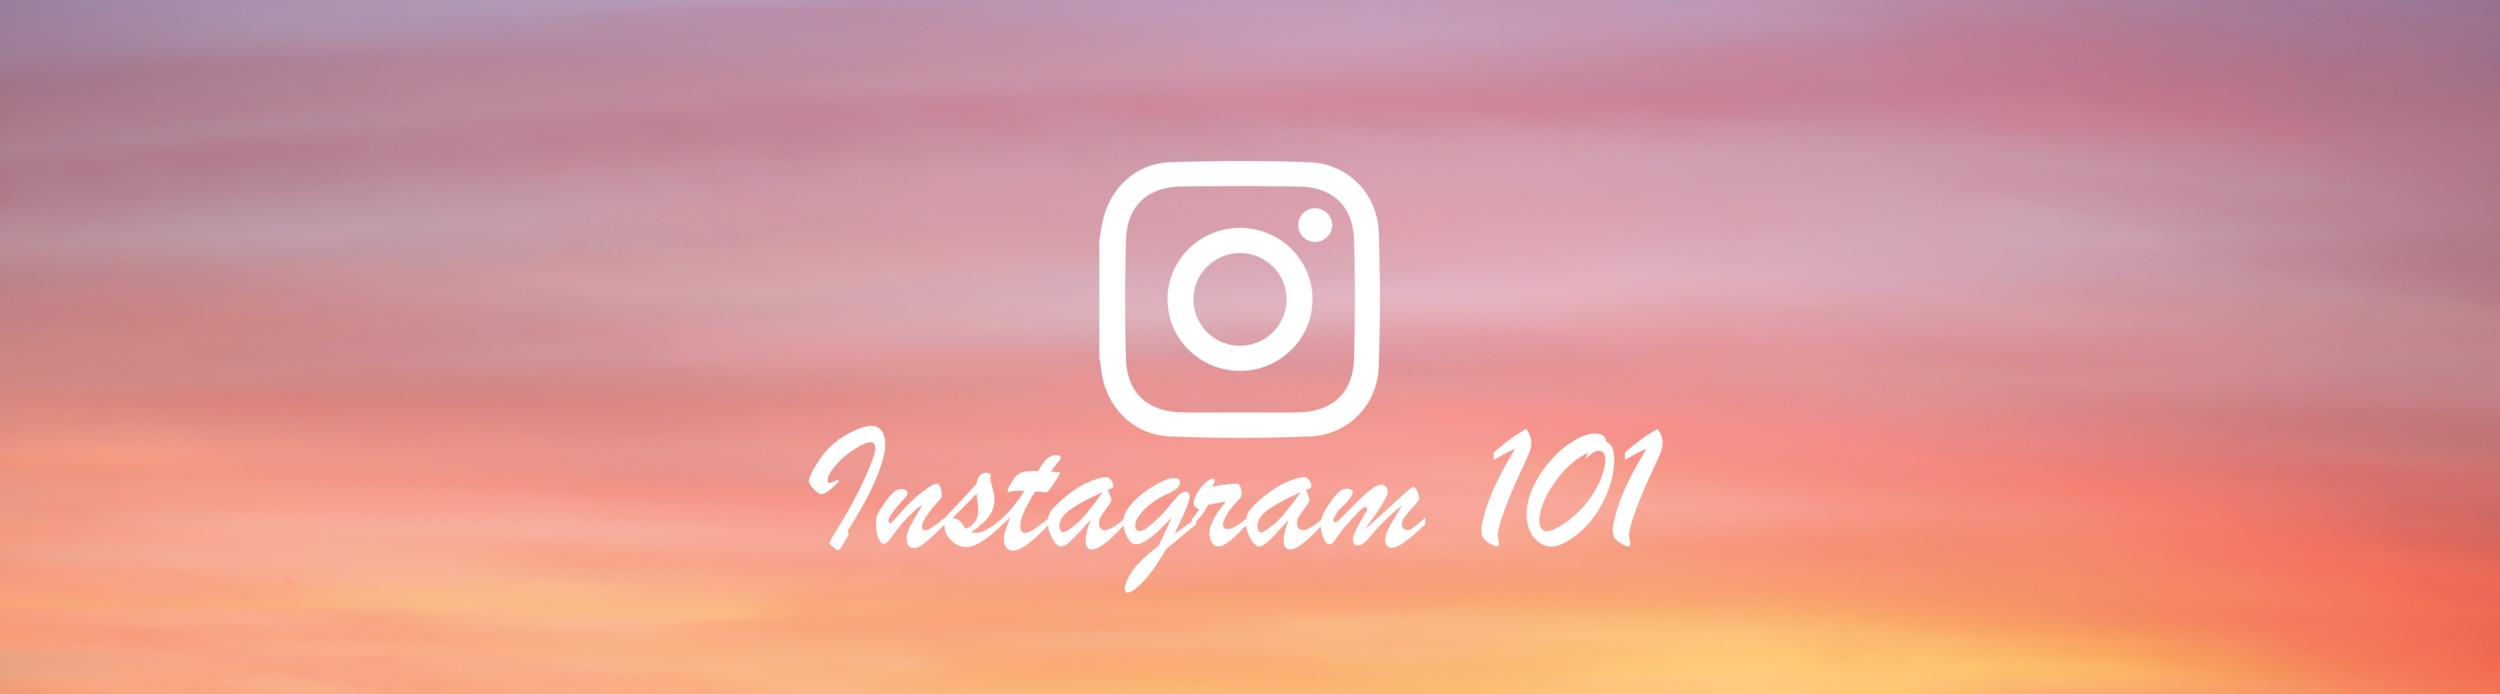 Instagram marketing introduction